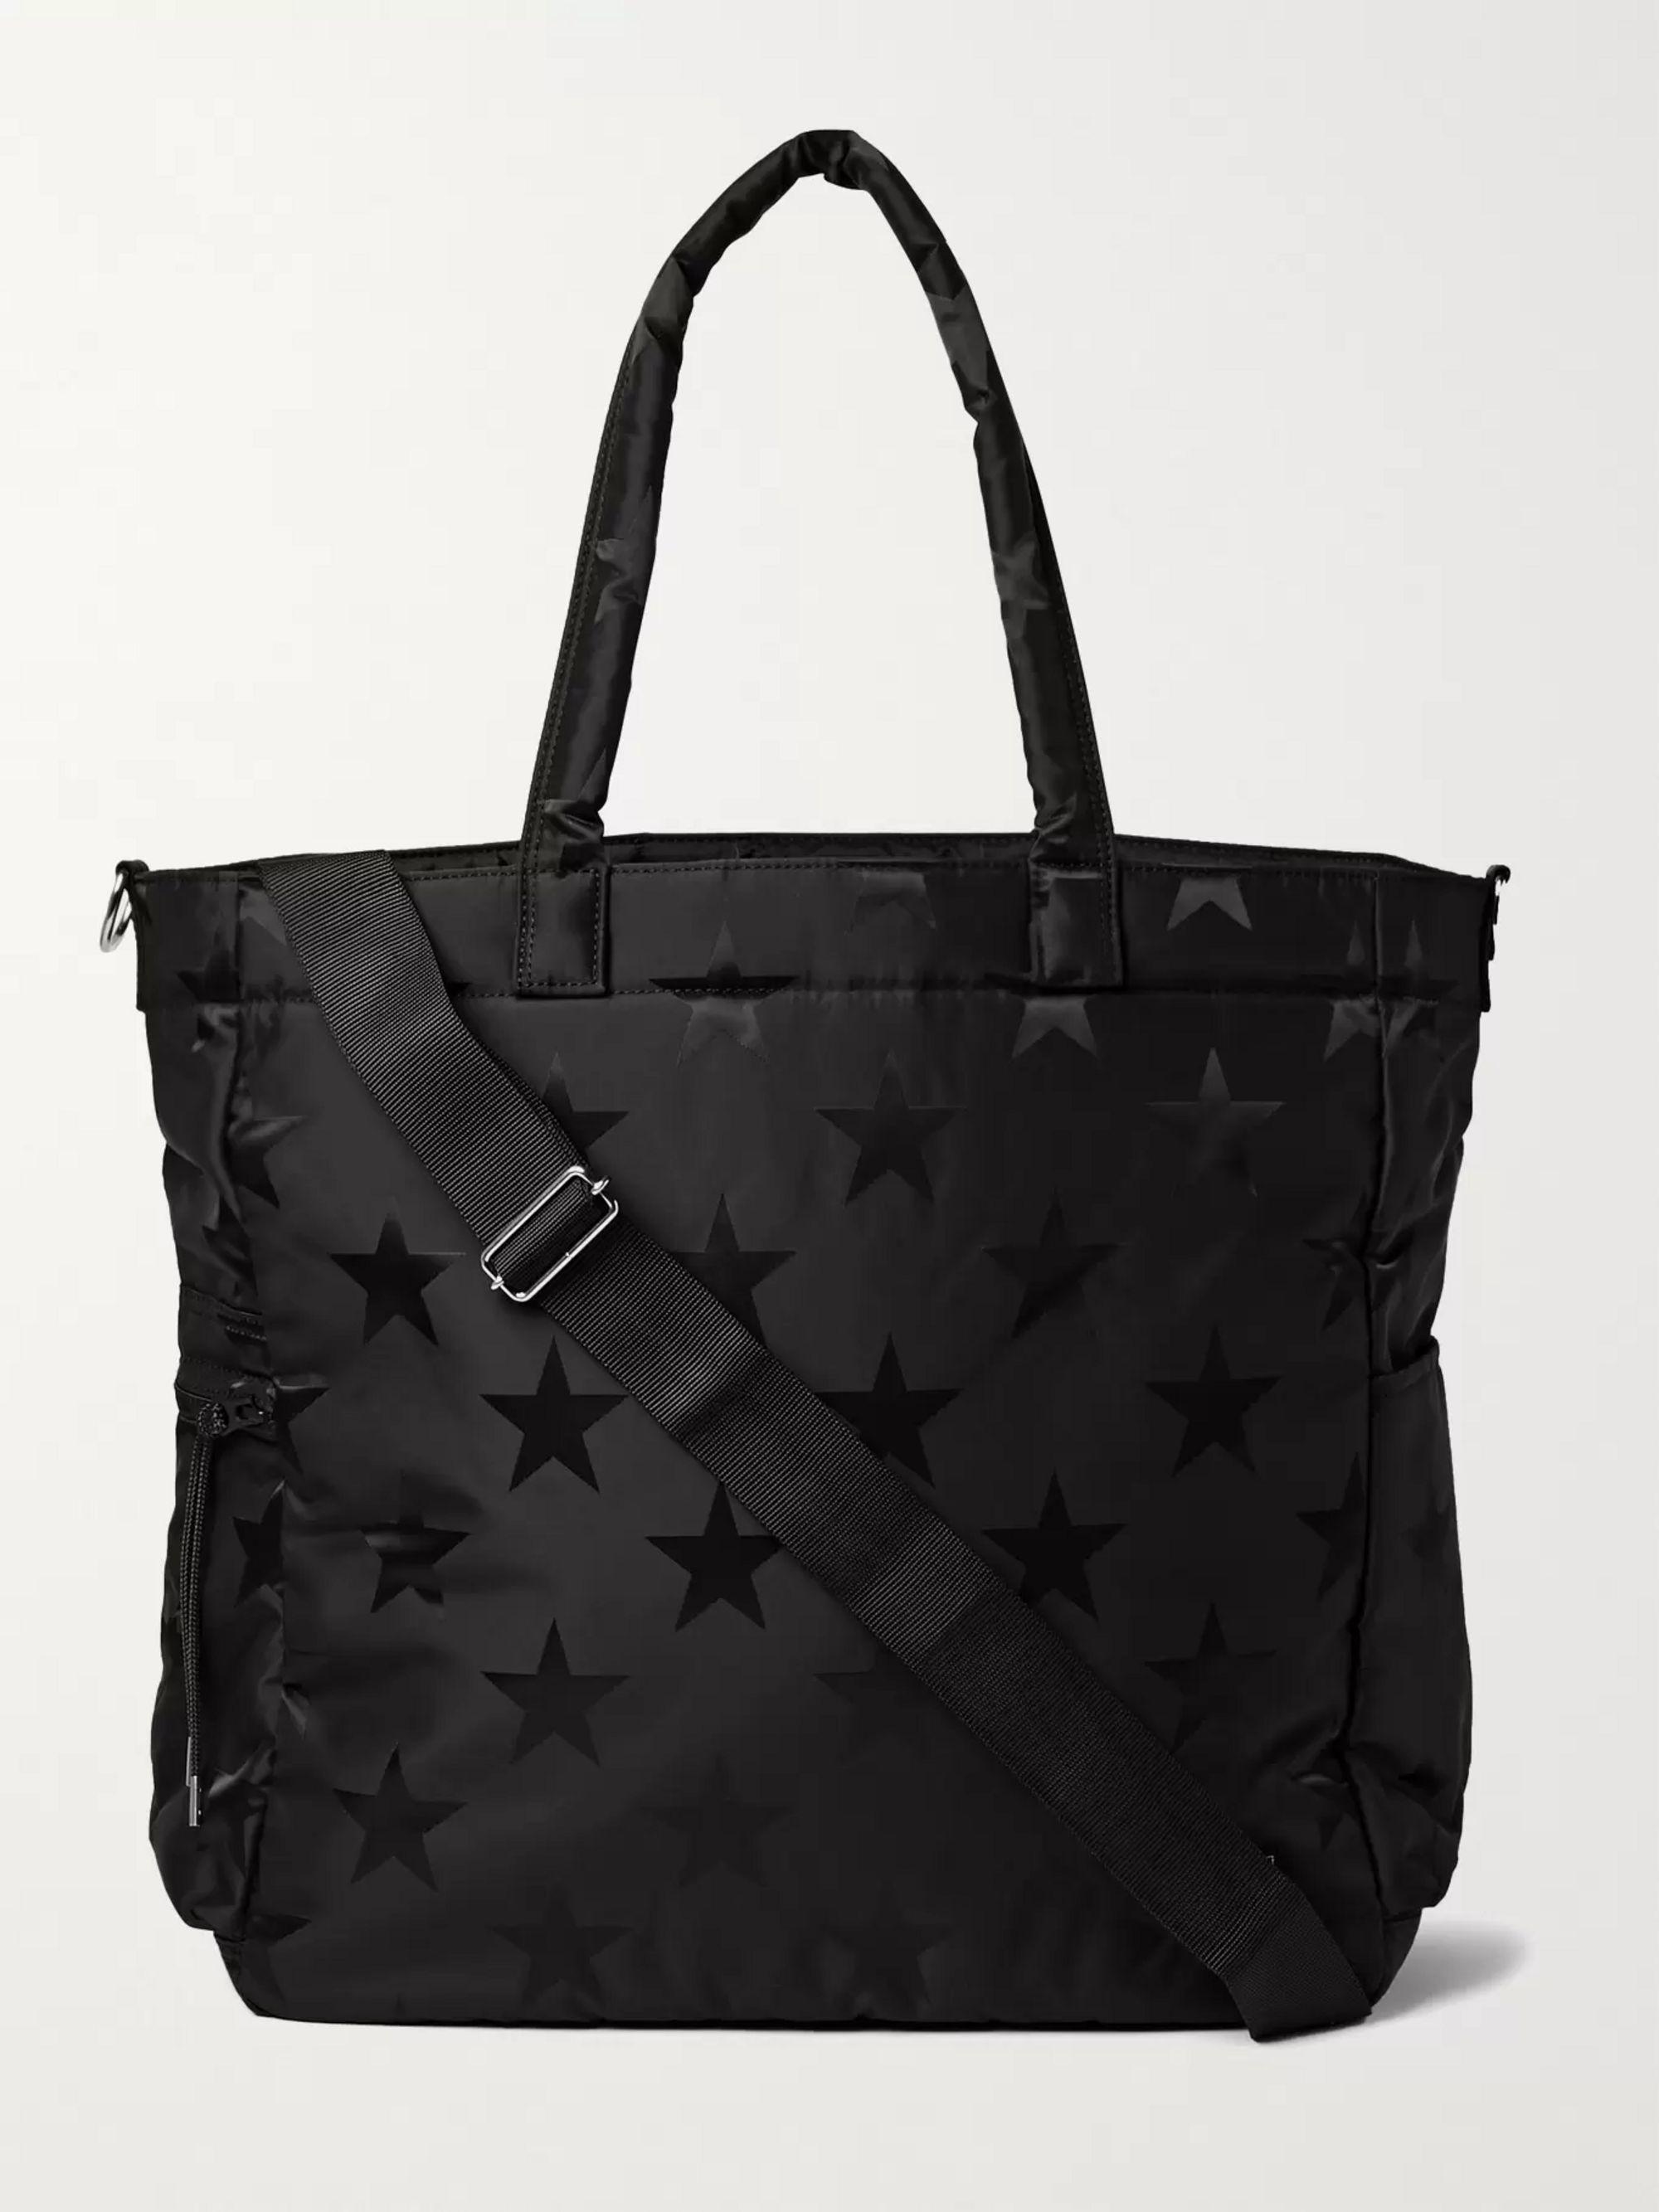 PORTER-YOSHIDA & CO 2Way Padded Printed Nylon Tote Bag,Black